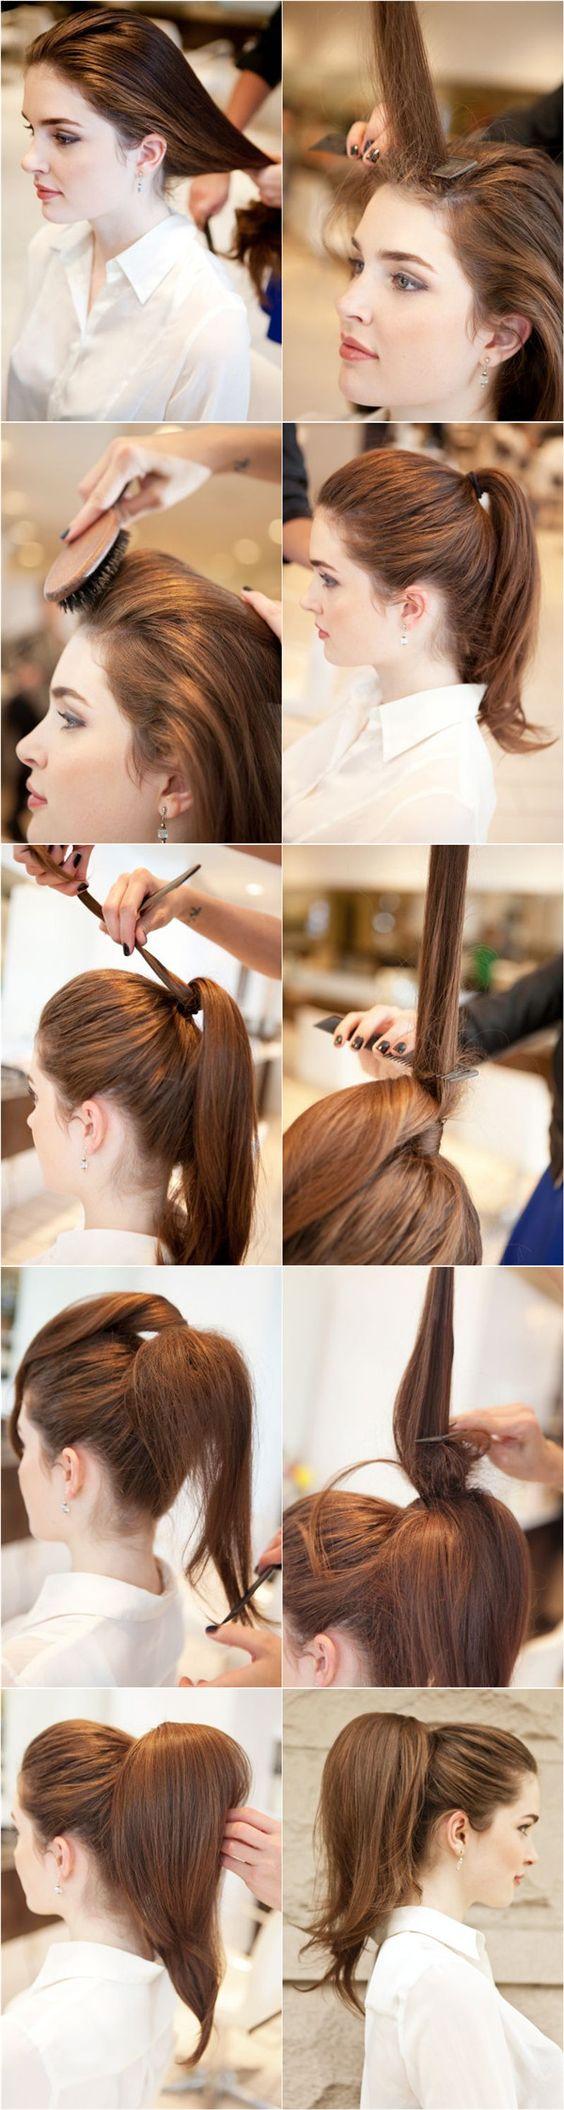 Enjoyable Ponytail Styles Fuller Ponytail And Big Ponytail On Pinterest Short Hairstyles Gunalazisus